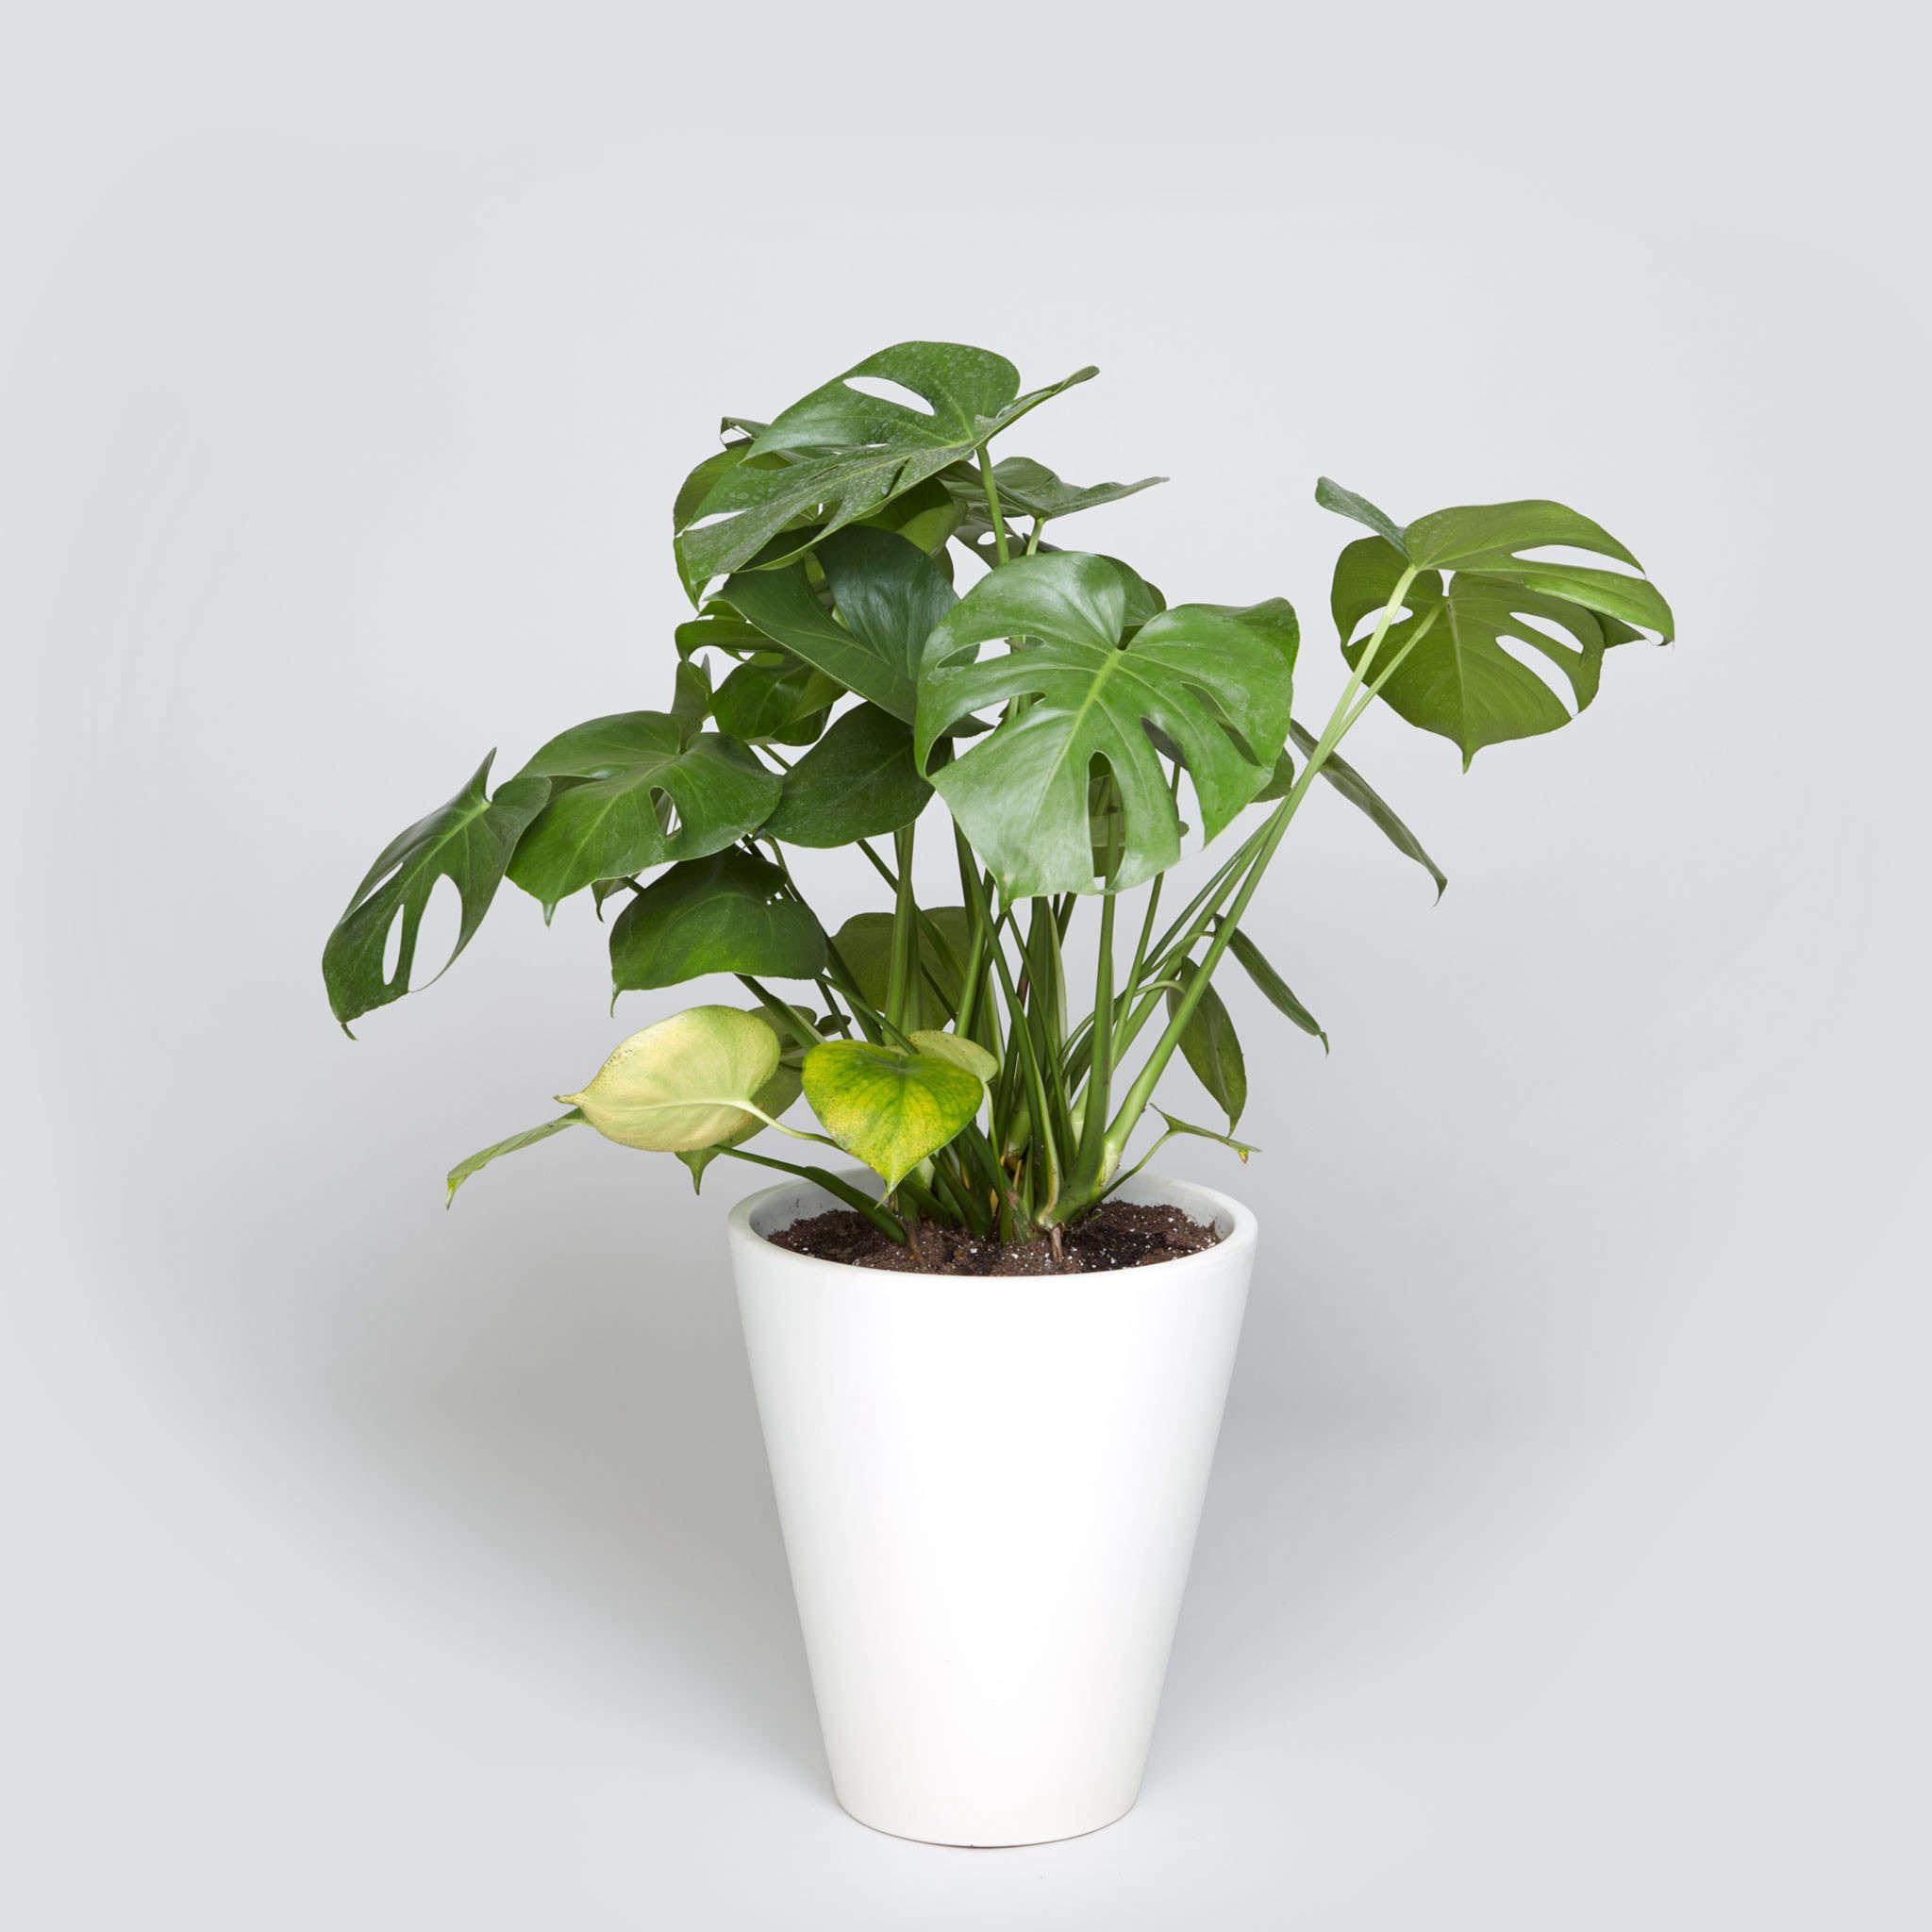 gardening 101 monstera gardenista. Black Bedroom Furniture Sets. Home Design Ideas